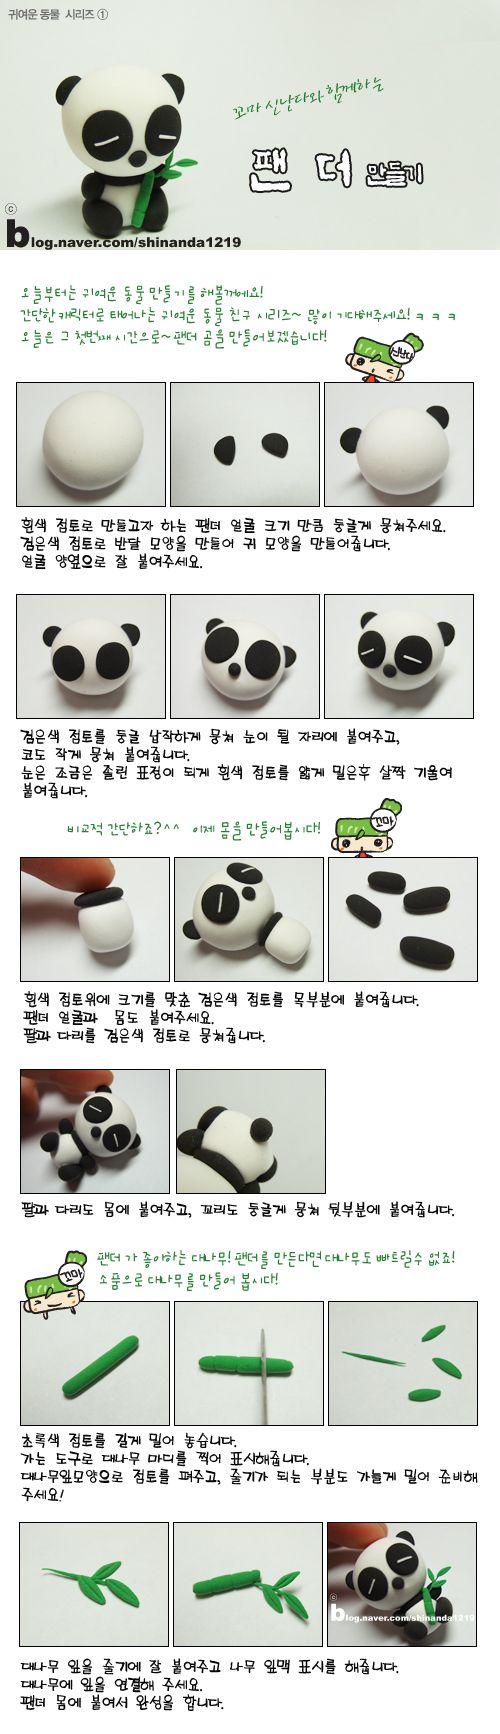 DIY Polymer Clay or Fimo Panda Tutorial